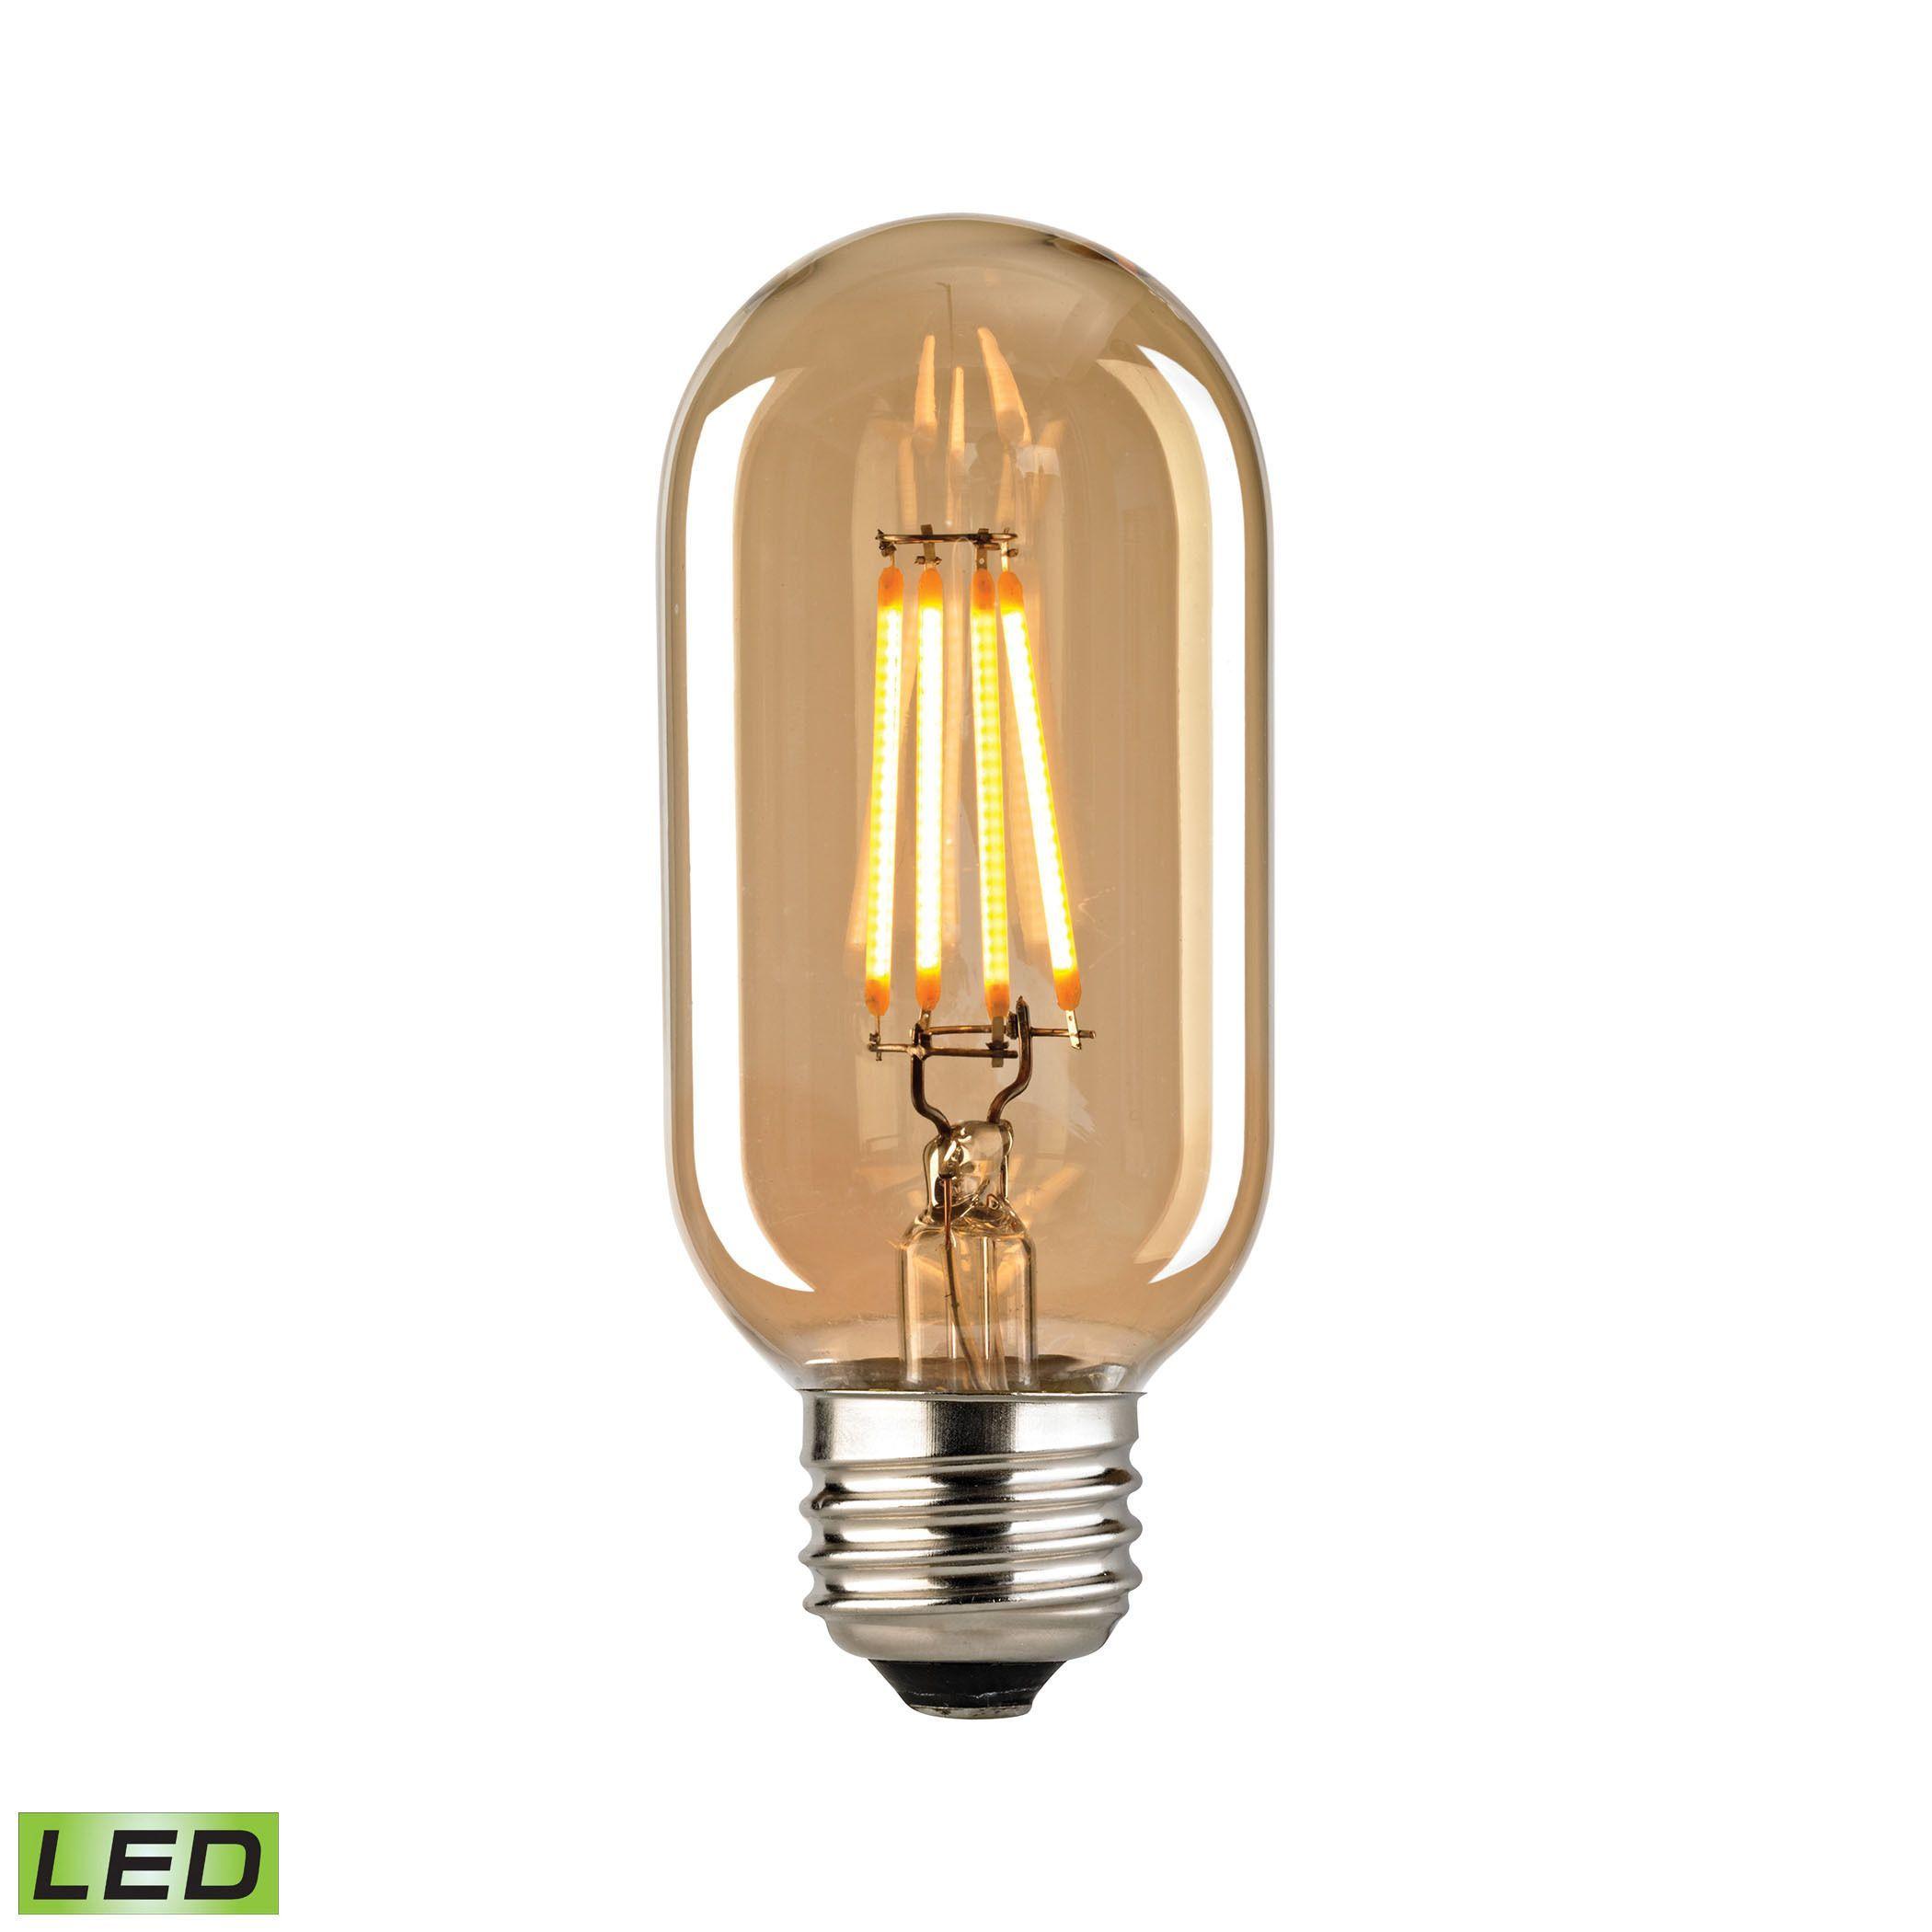 Teardrop st64 william and watson vintage edison bulb industrial light - Elk Filament Medium Led Bulb With Light Gold Tint Light Gold Tint Clear